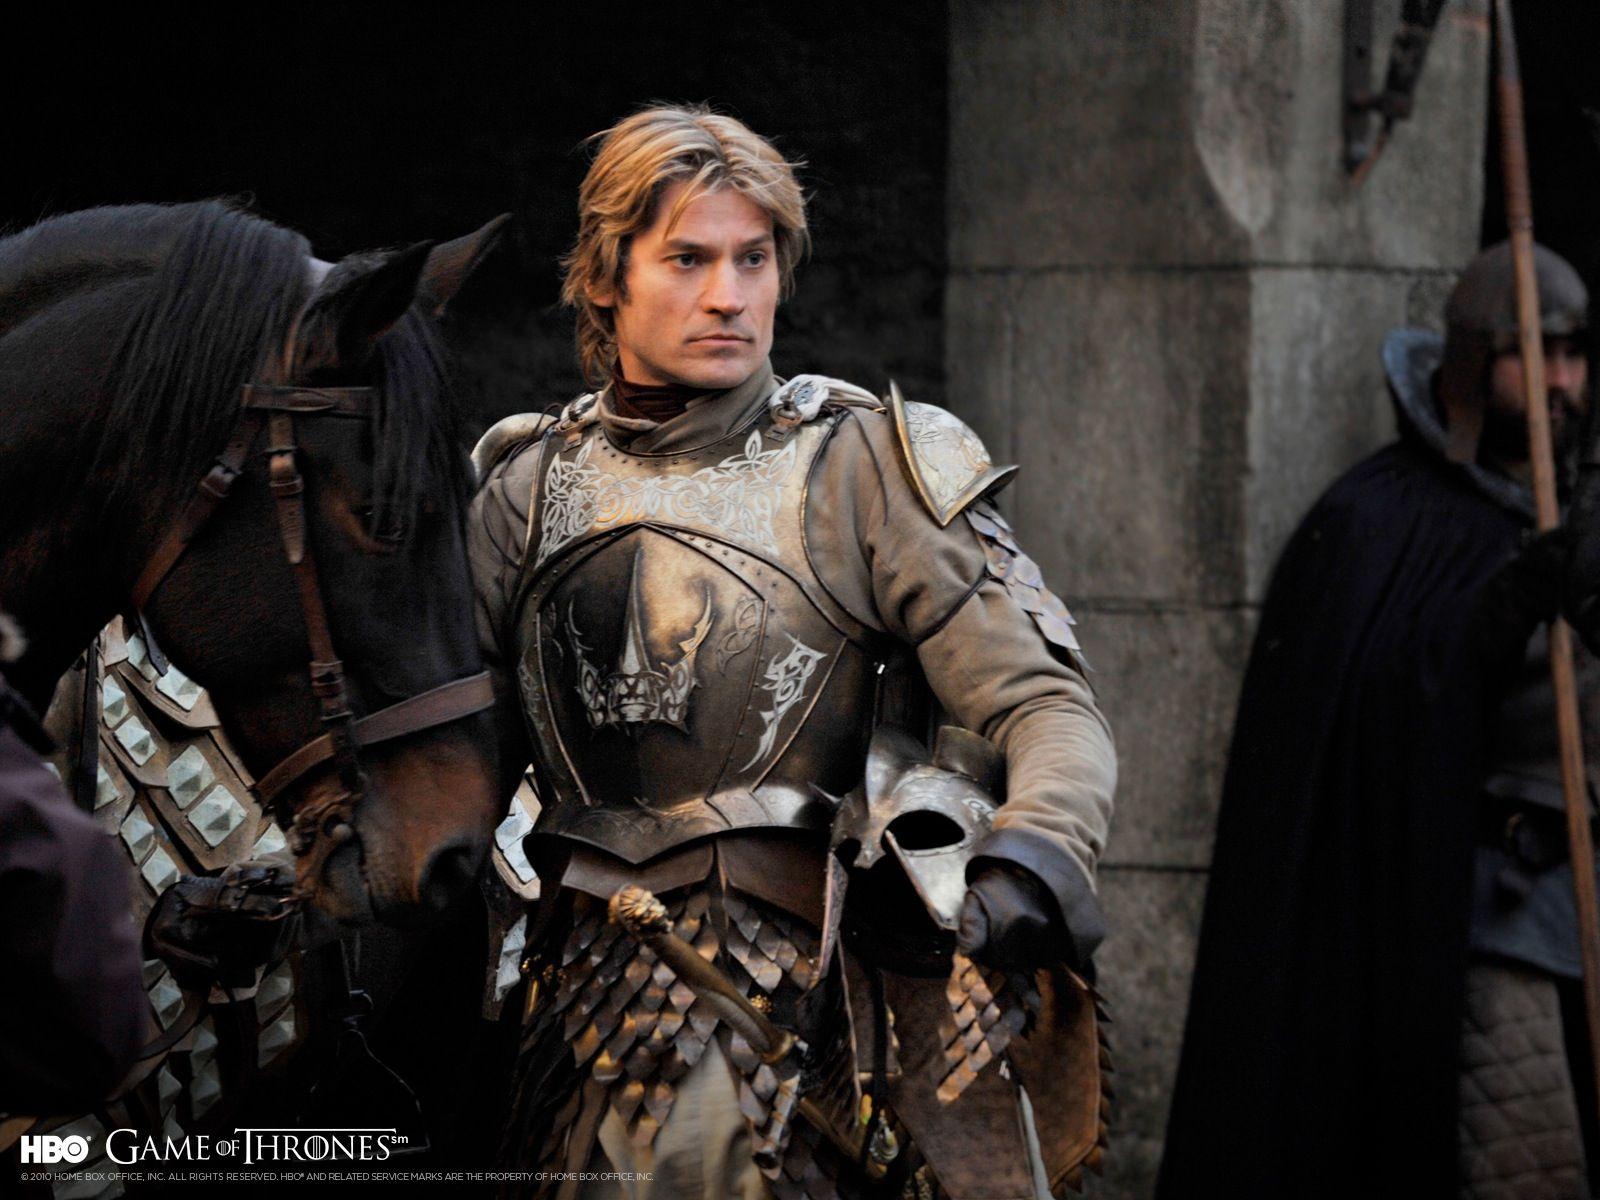 game of thrones jaime lannister hand cut off scene